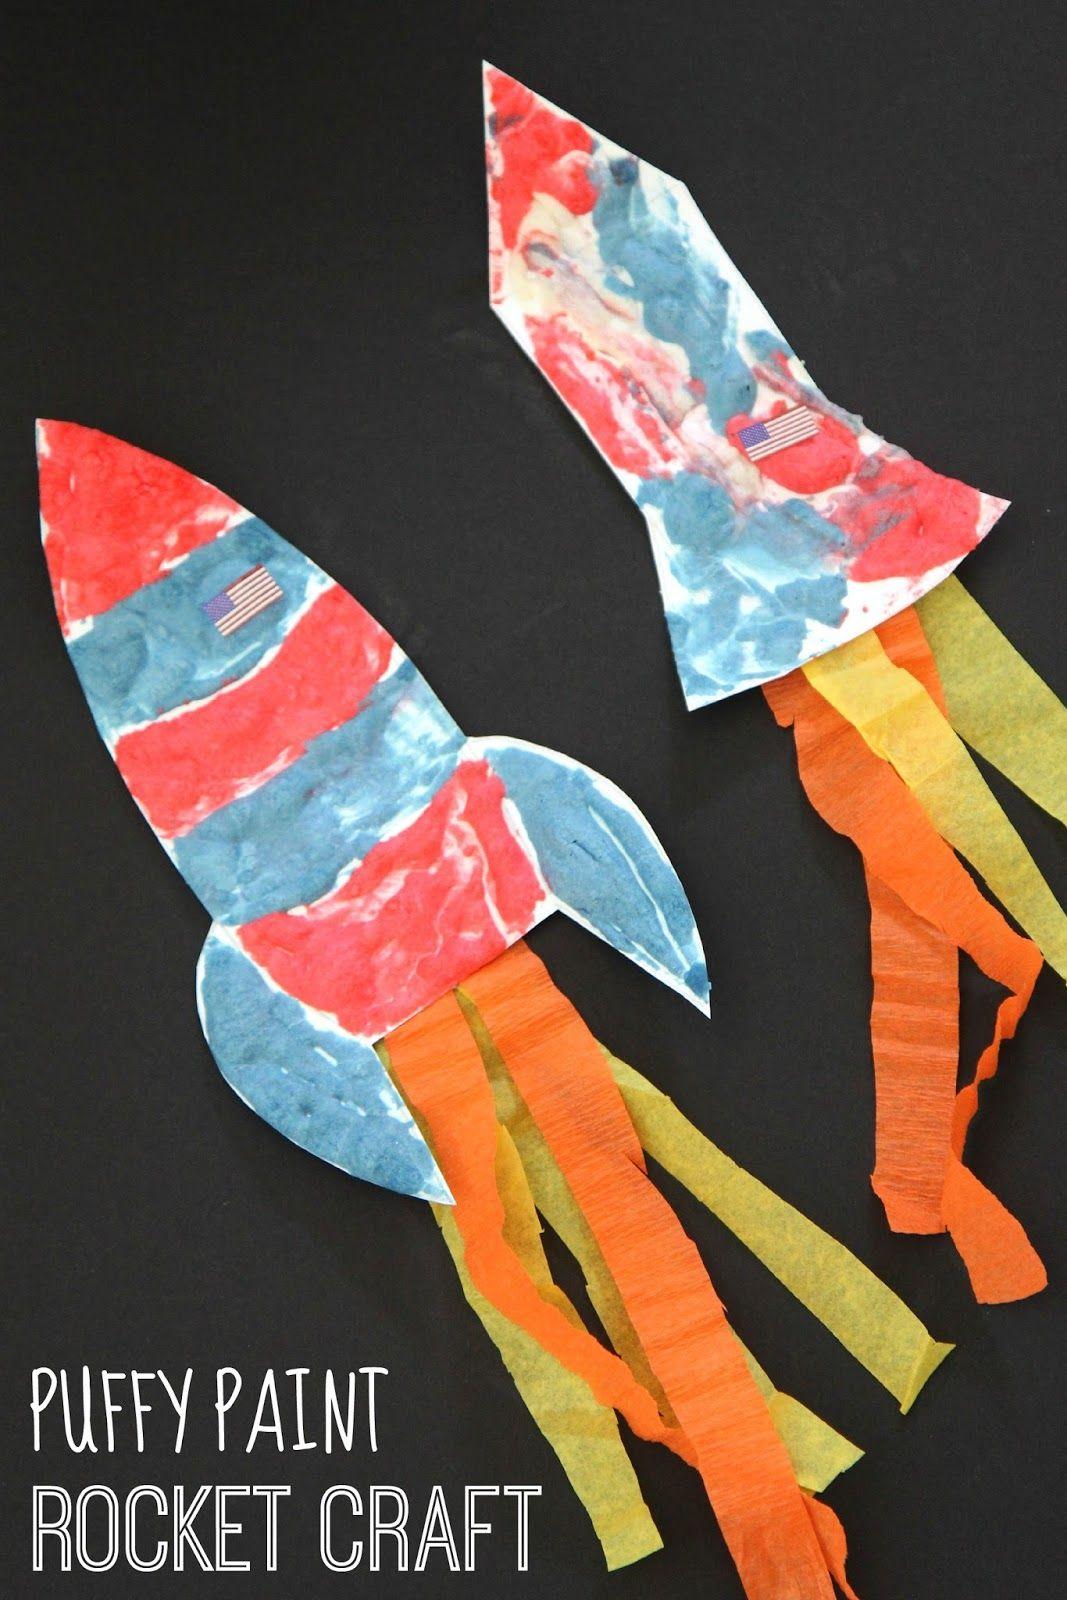 Puffy Paint Rocket Craft